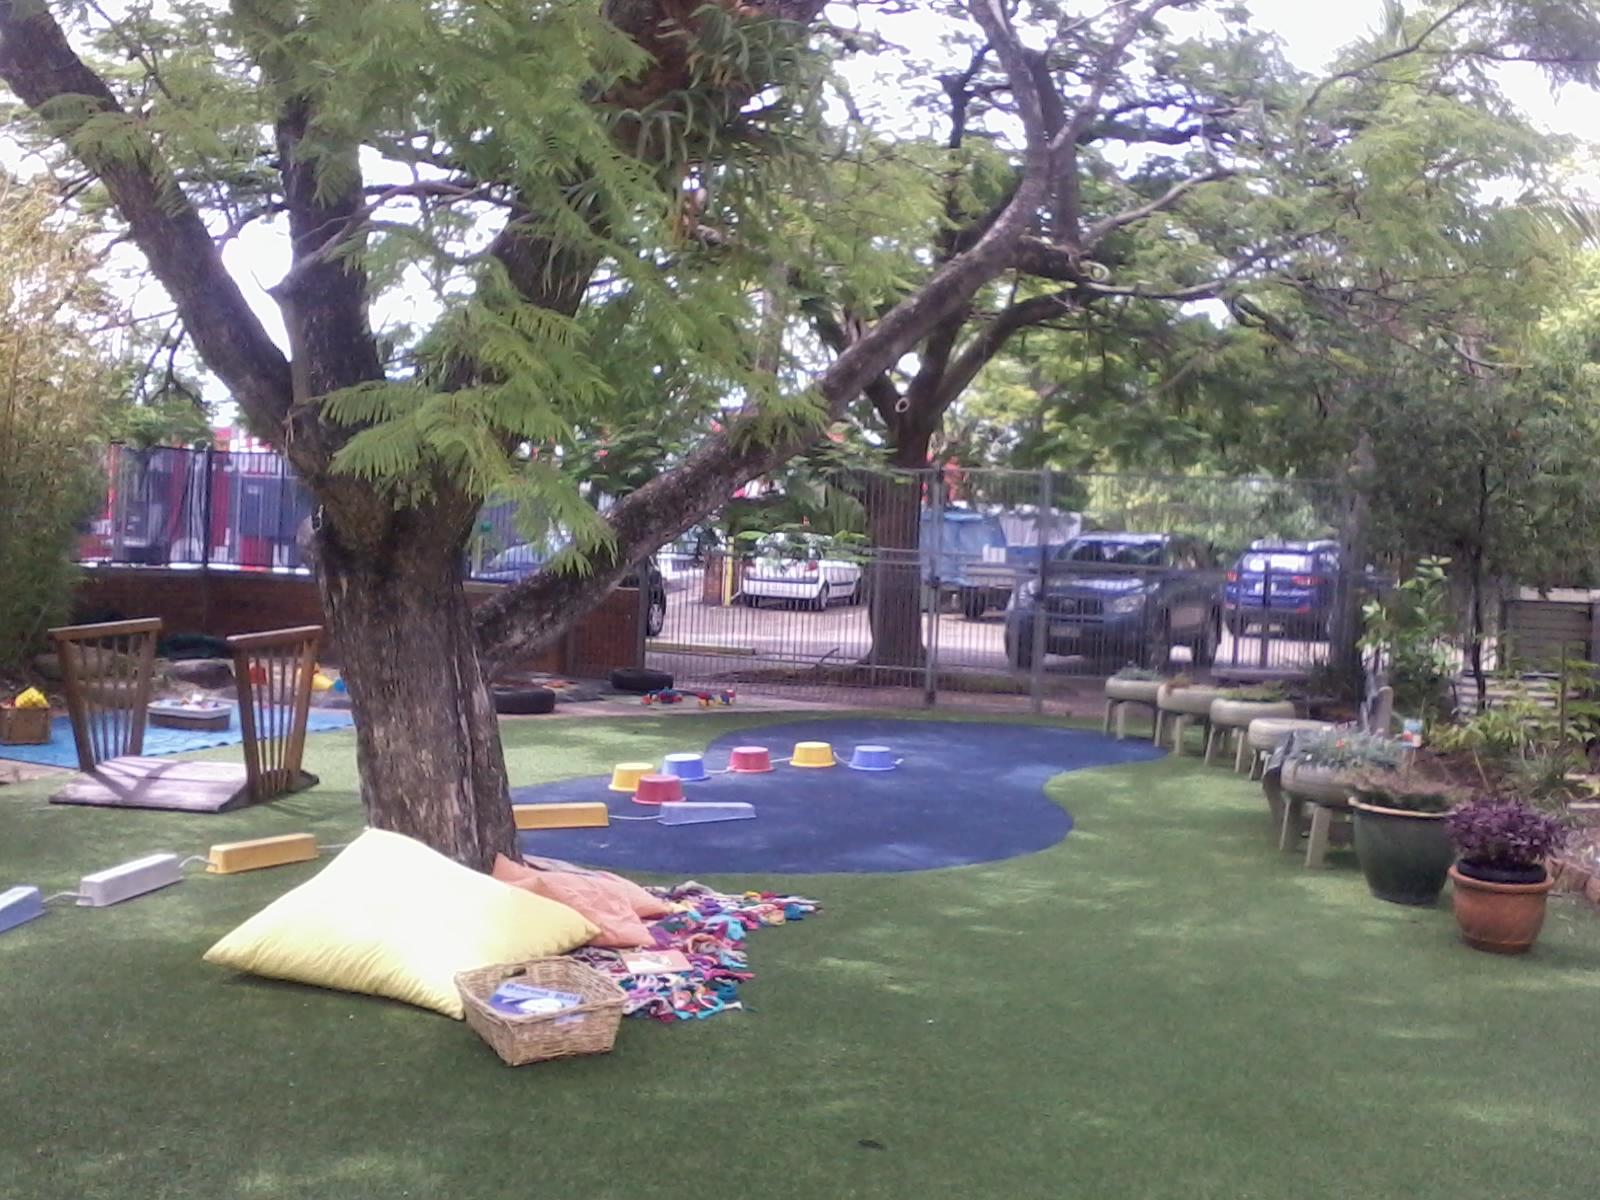 Visita a tres jardines infantiles en brisbane australia for Actividades para jardin